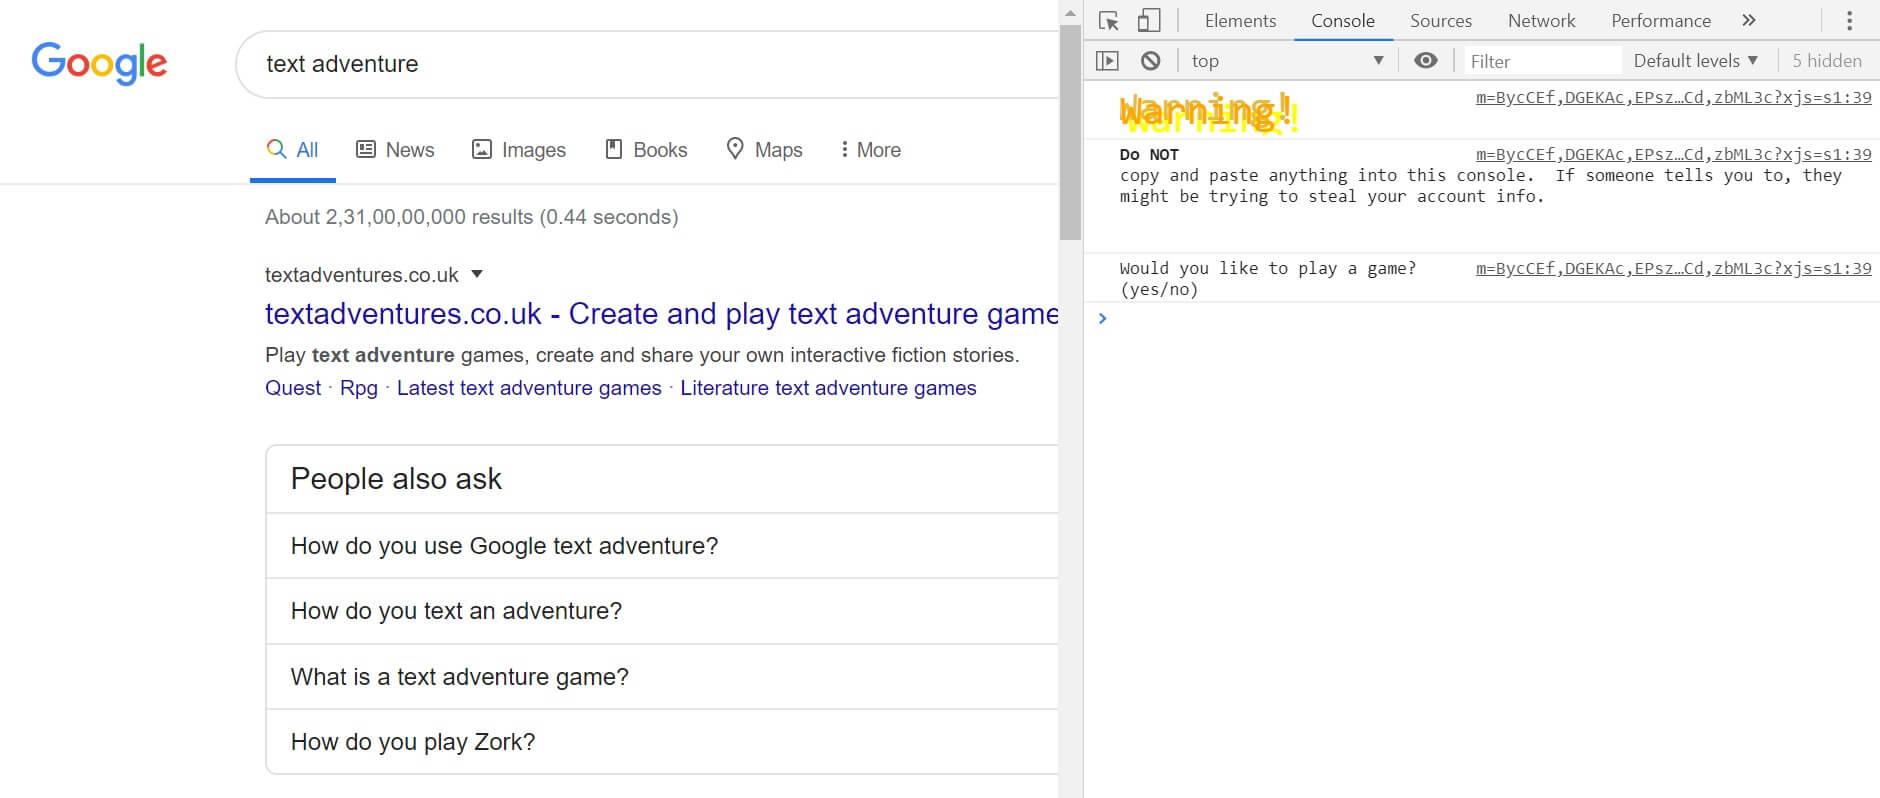 Text Adventure | Hidden Google Games to Play